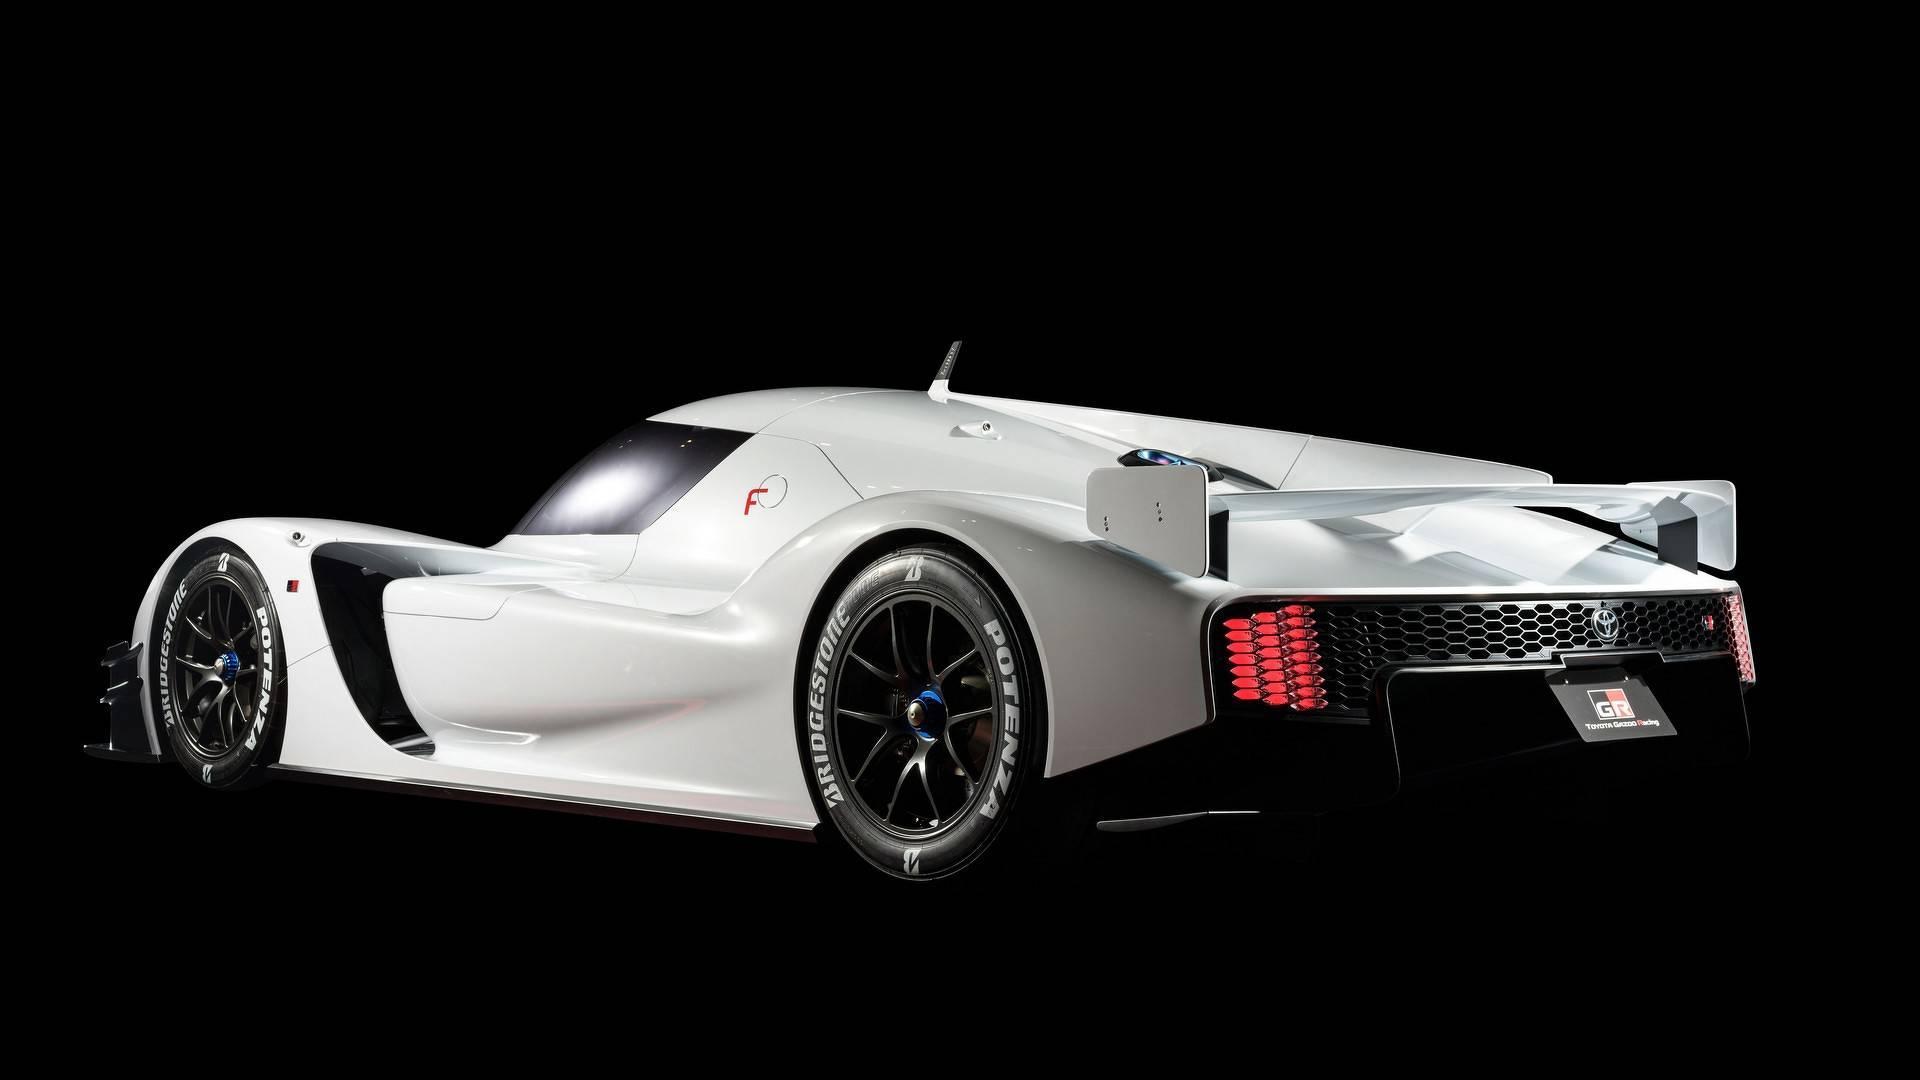 Toyota-GR-Super-Sport-Concept-2018-3.jpg